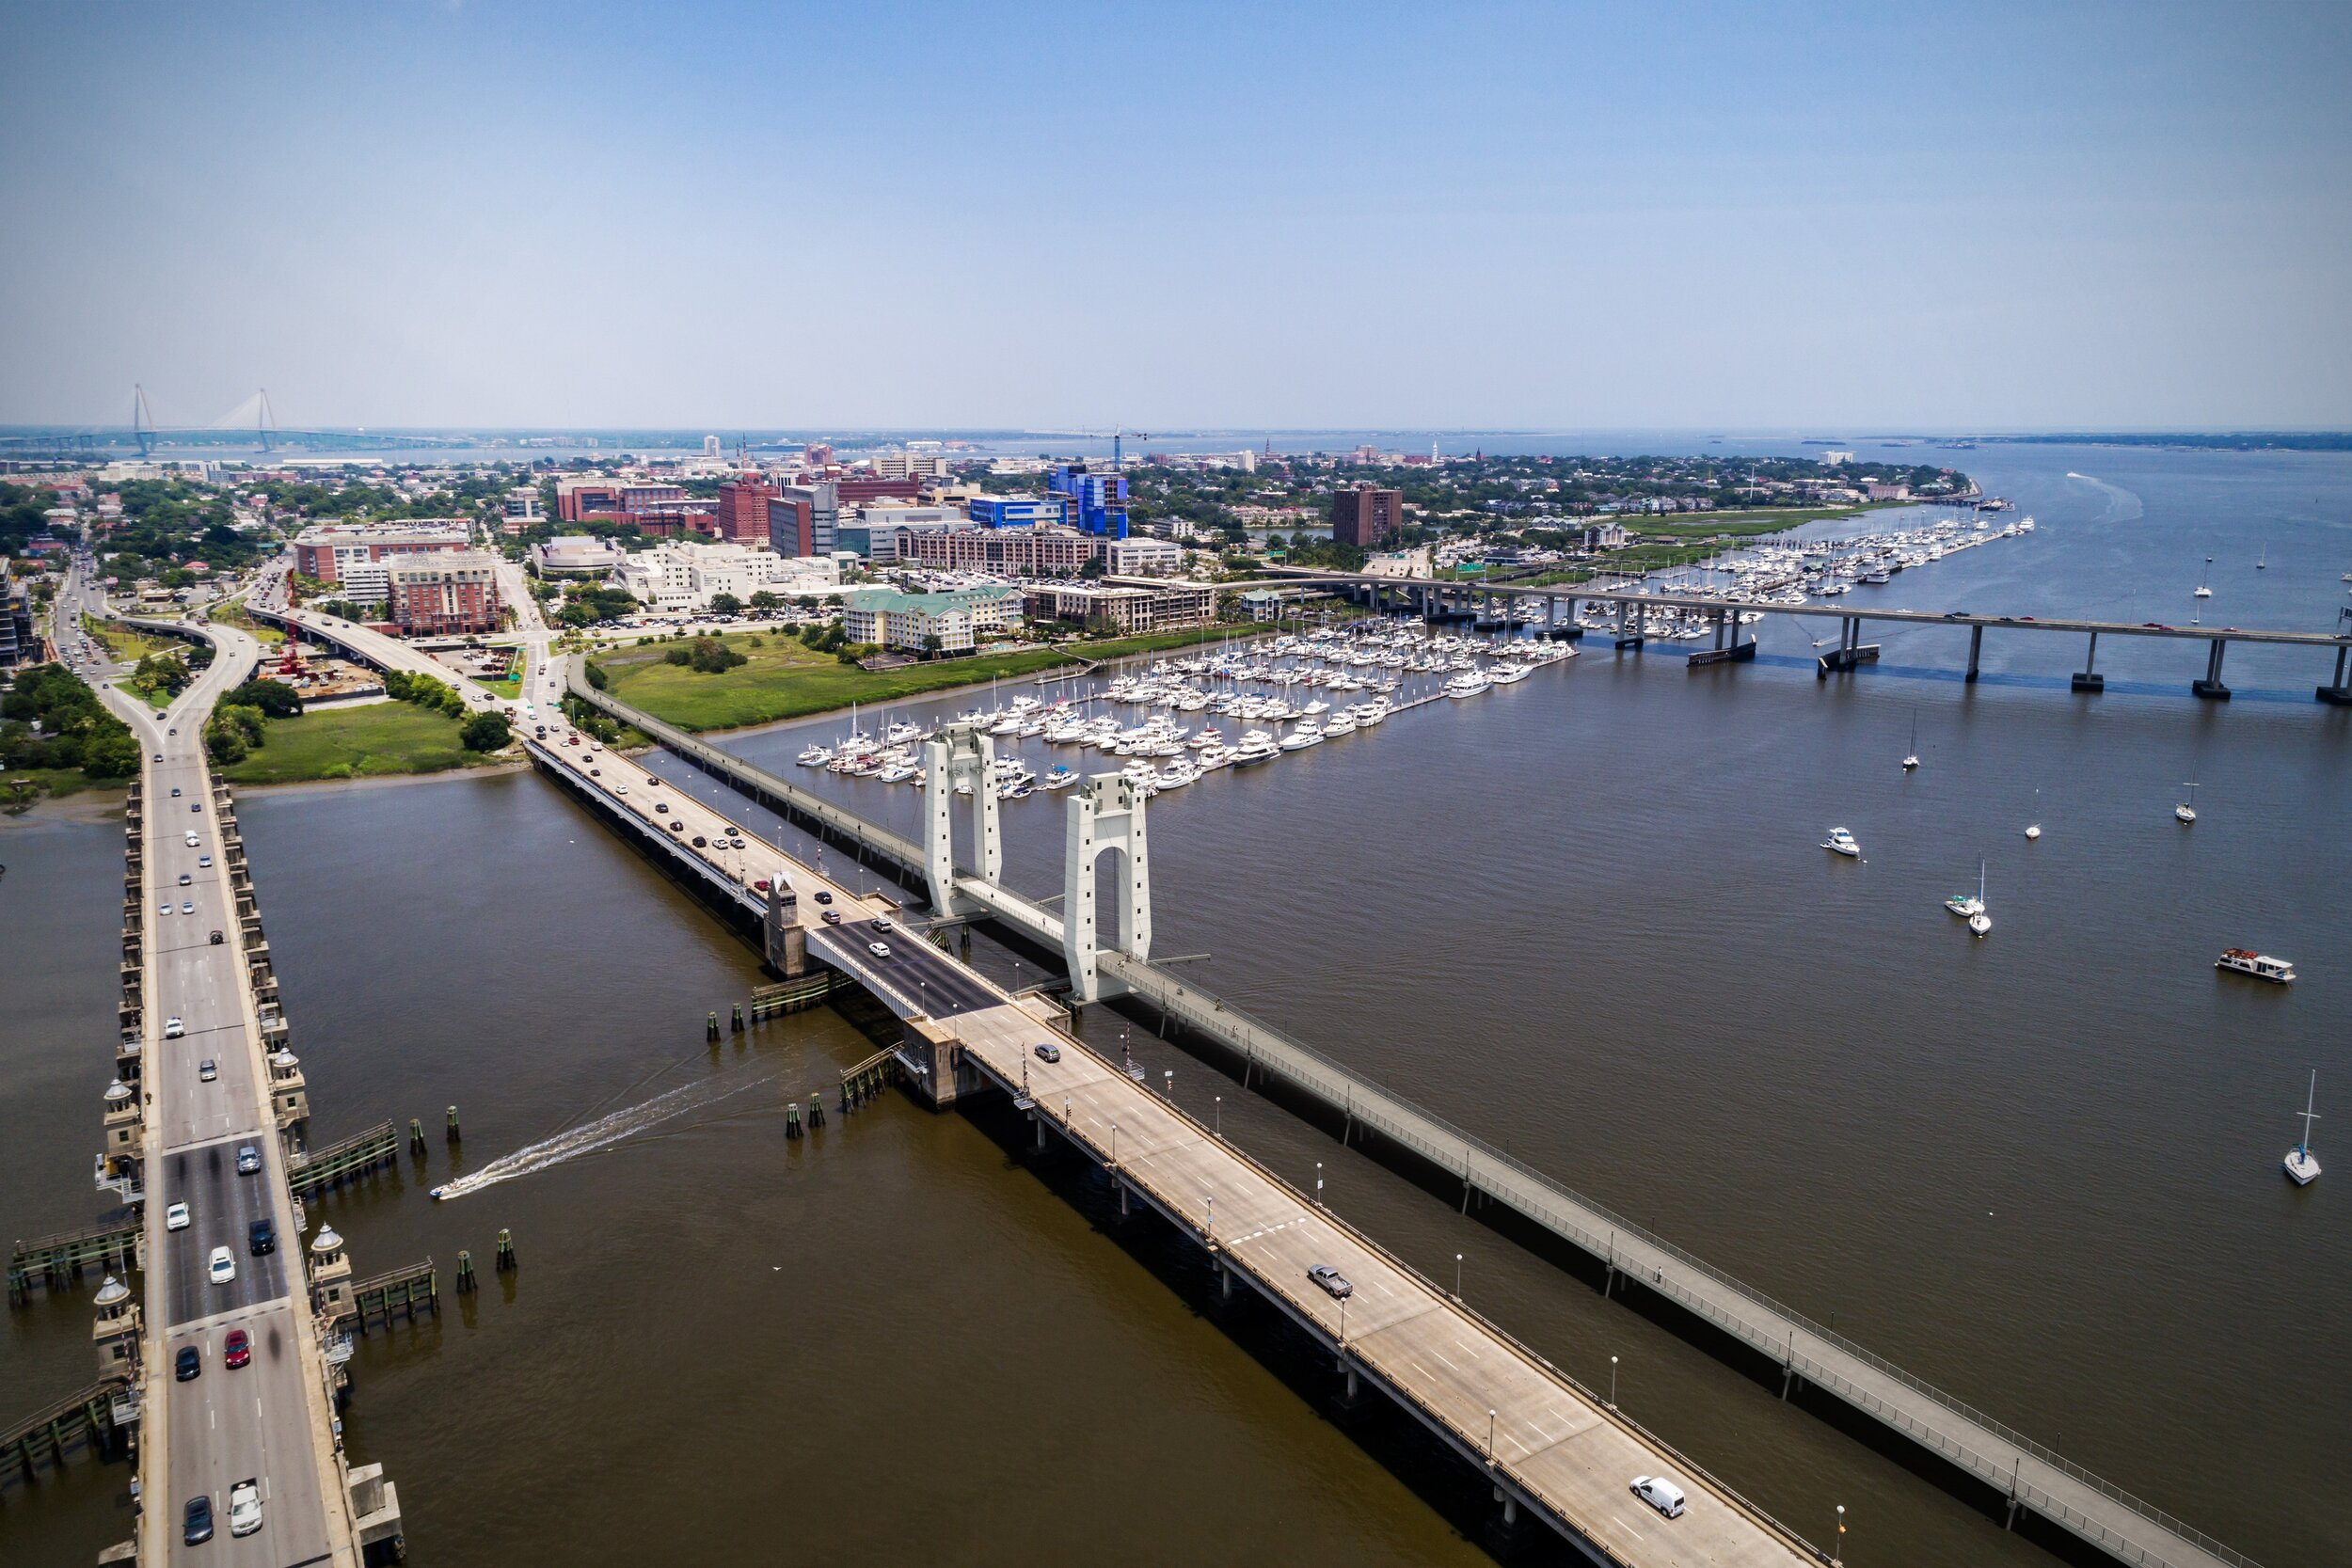 Ashley River Crossing Bike and Pedestrian Bridge, Image Credit: HDR